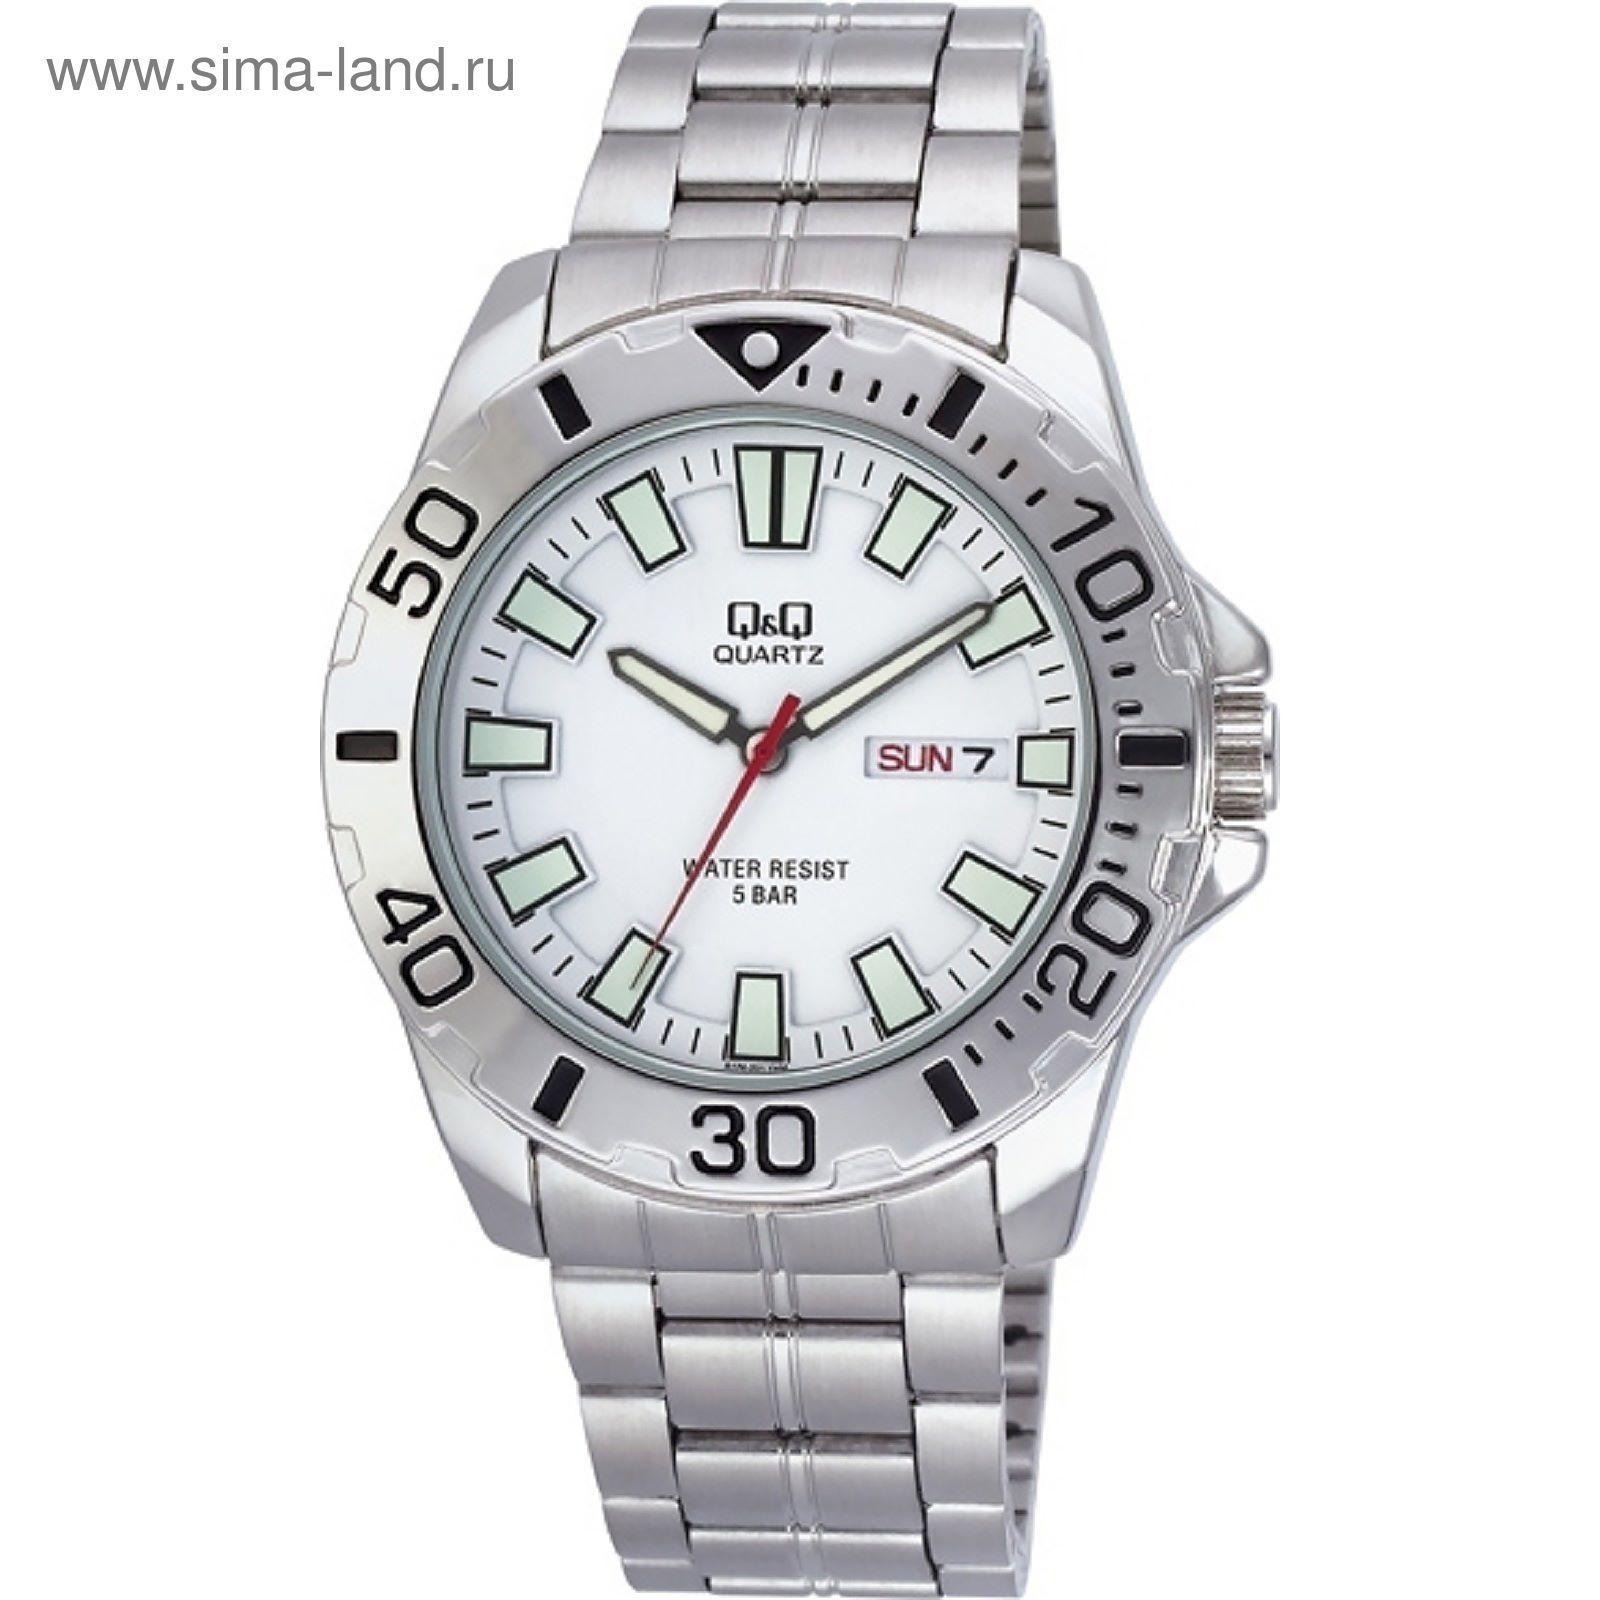 060f1f7f Часы наручные мужские Q&Q A174-201 (1589237) - Купить по цене от ...